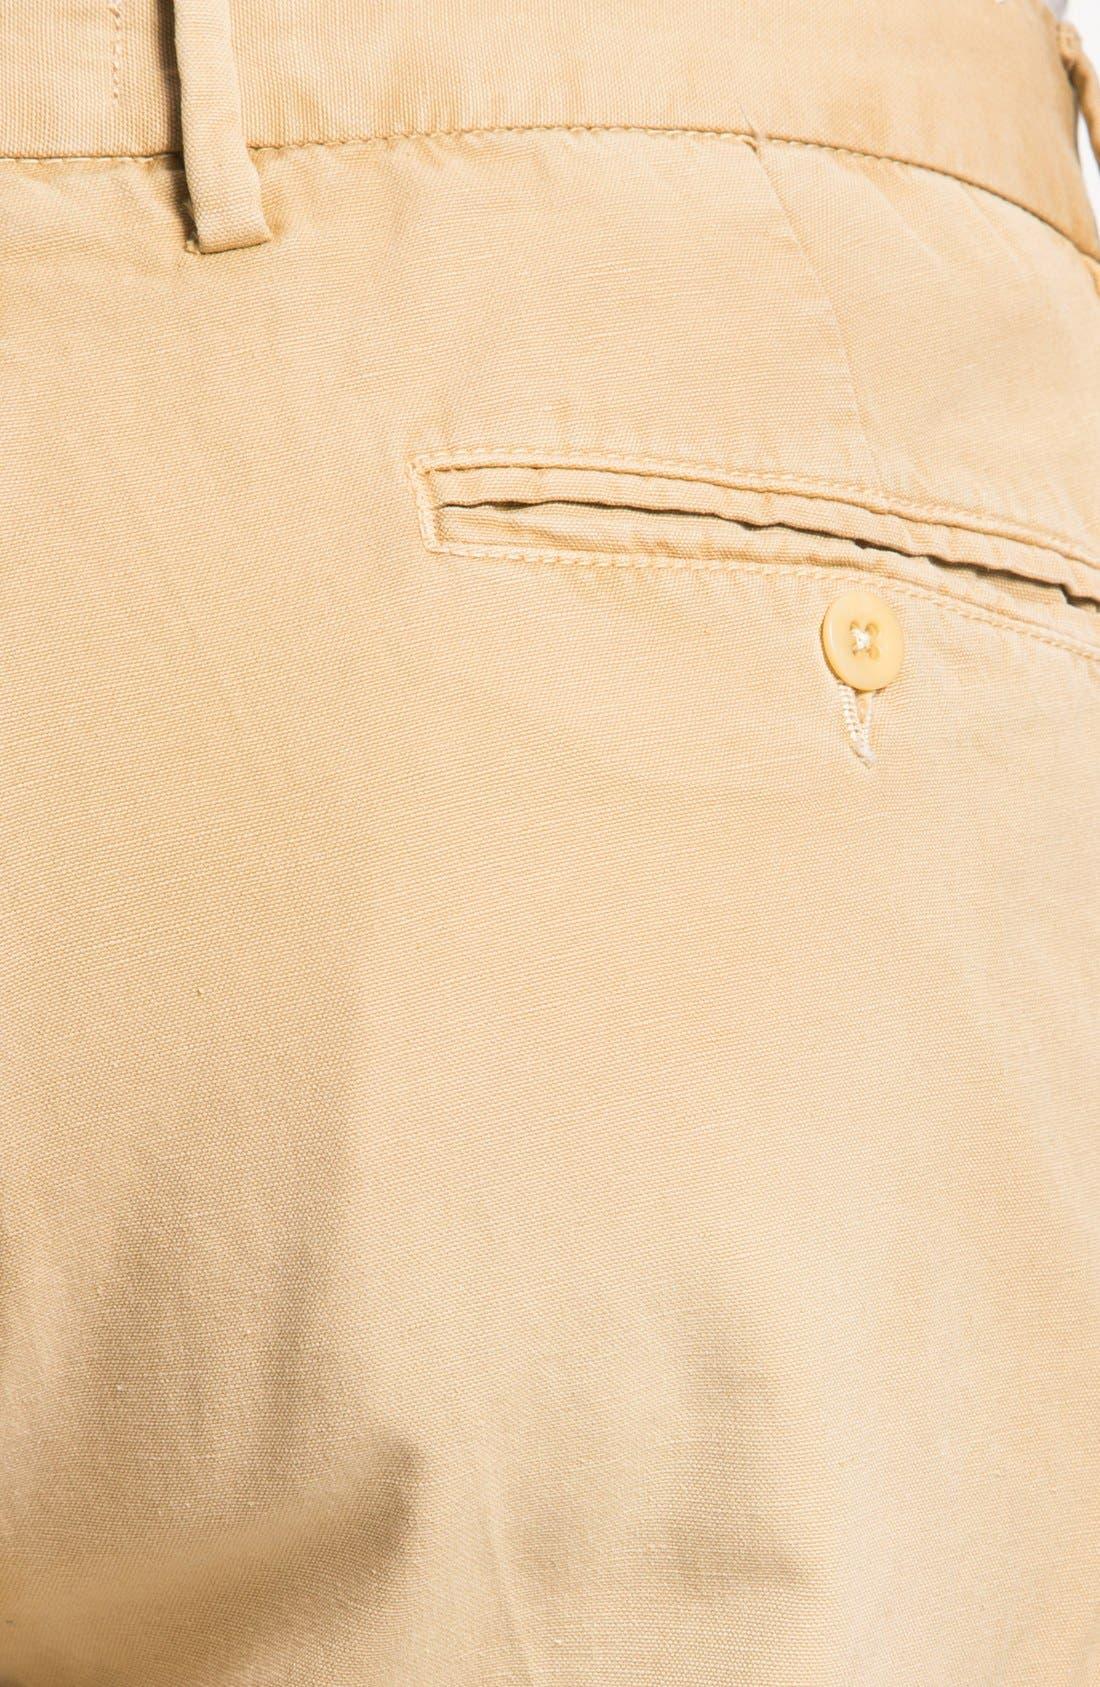 Alternate Image 3  - Gant Rugger Slim Fit Canvas Chinos